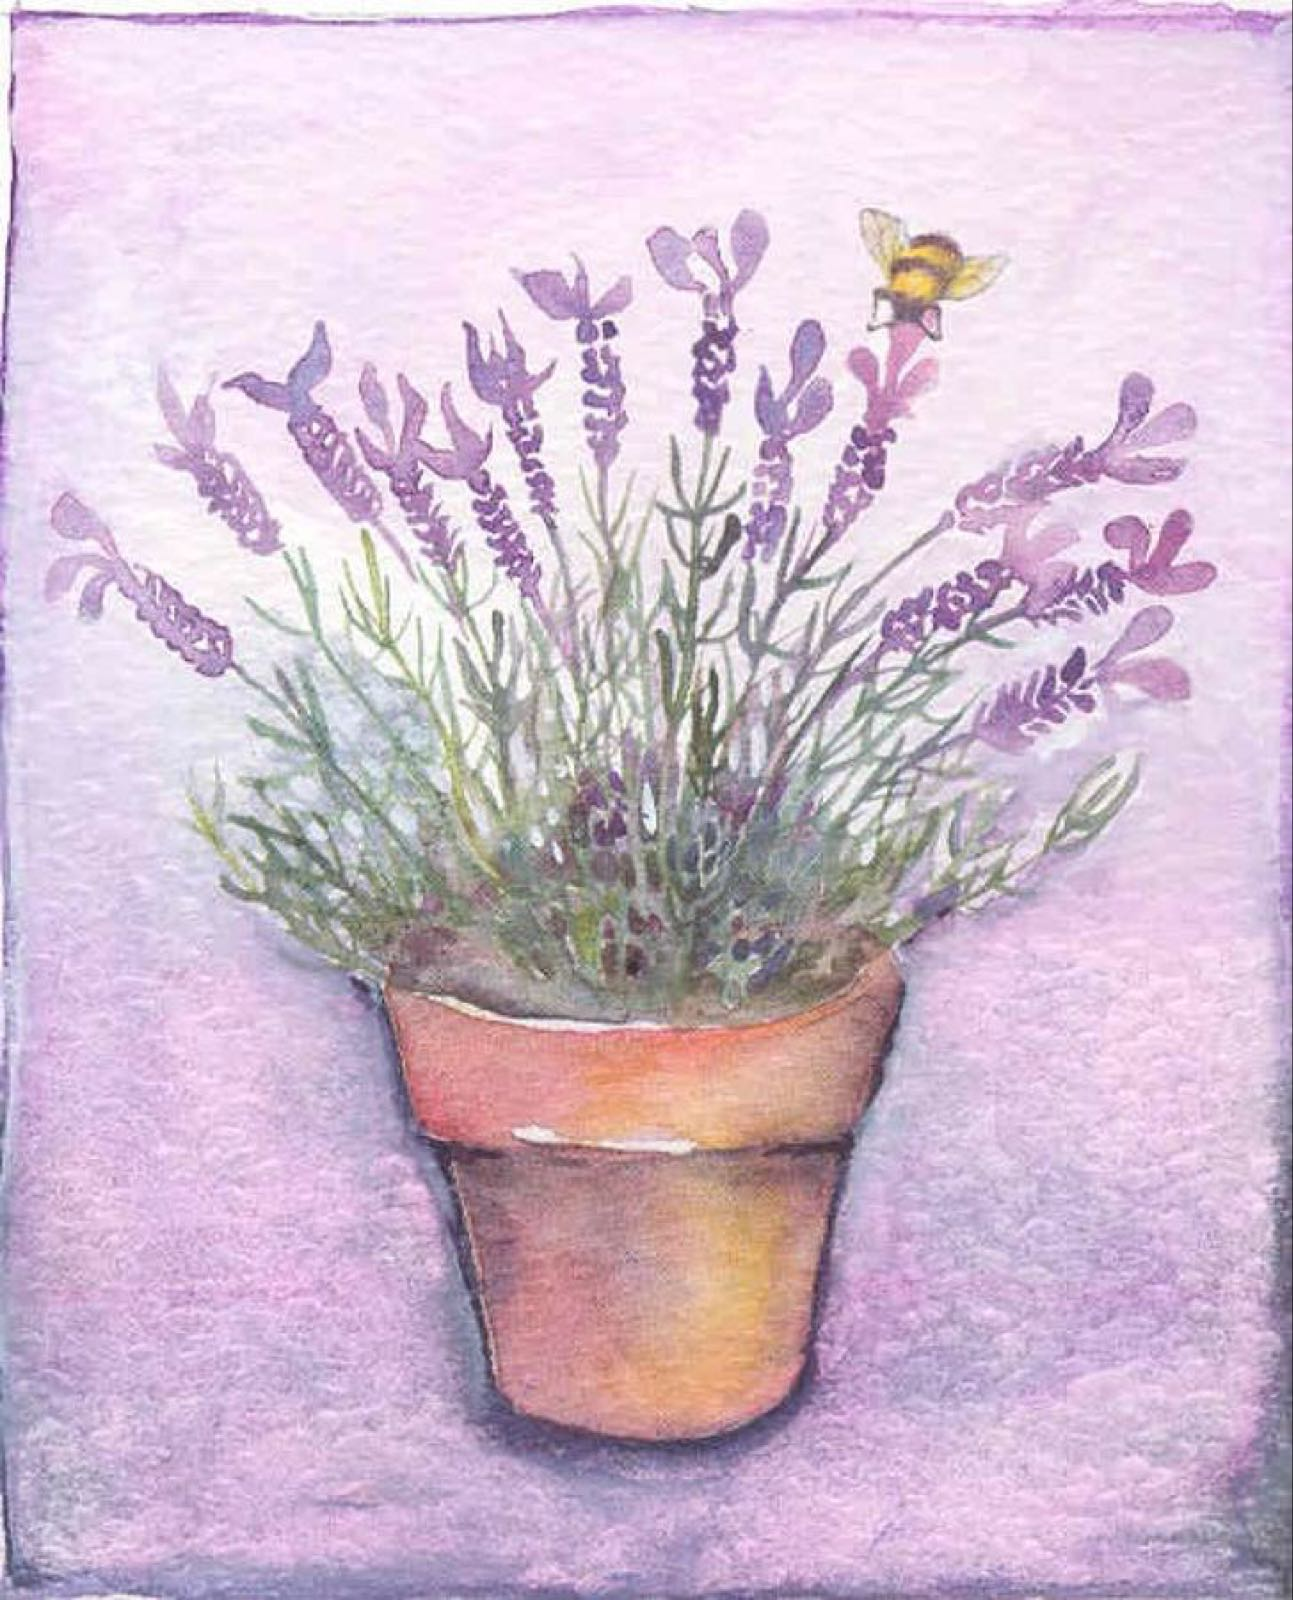 'Lavender & Bee' Furzedown Gallery Mini Card